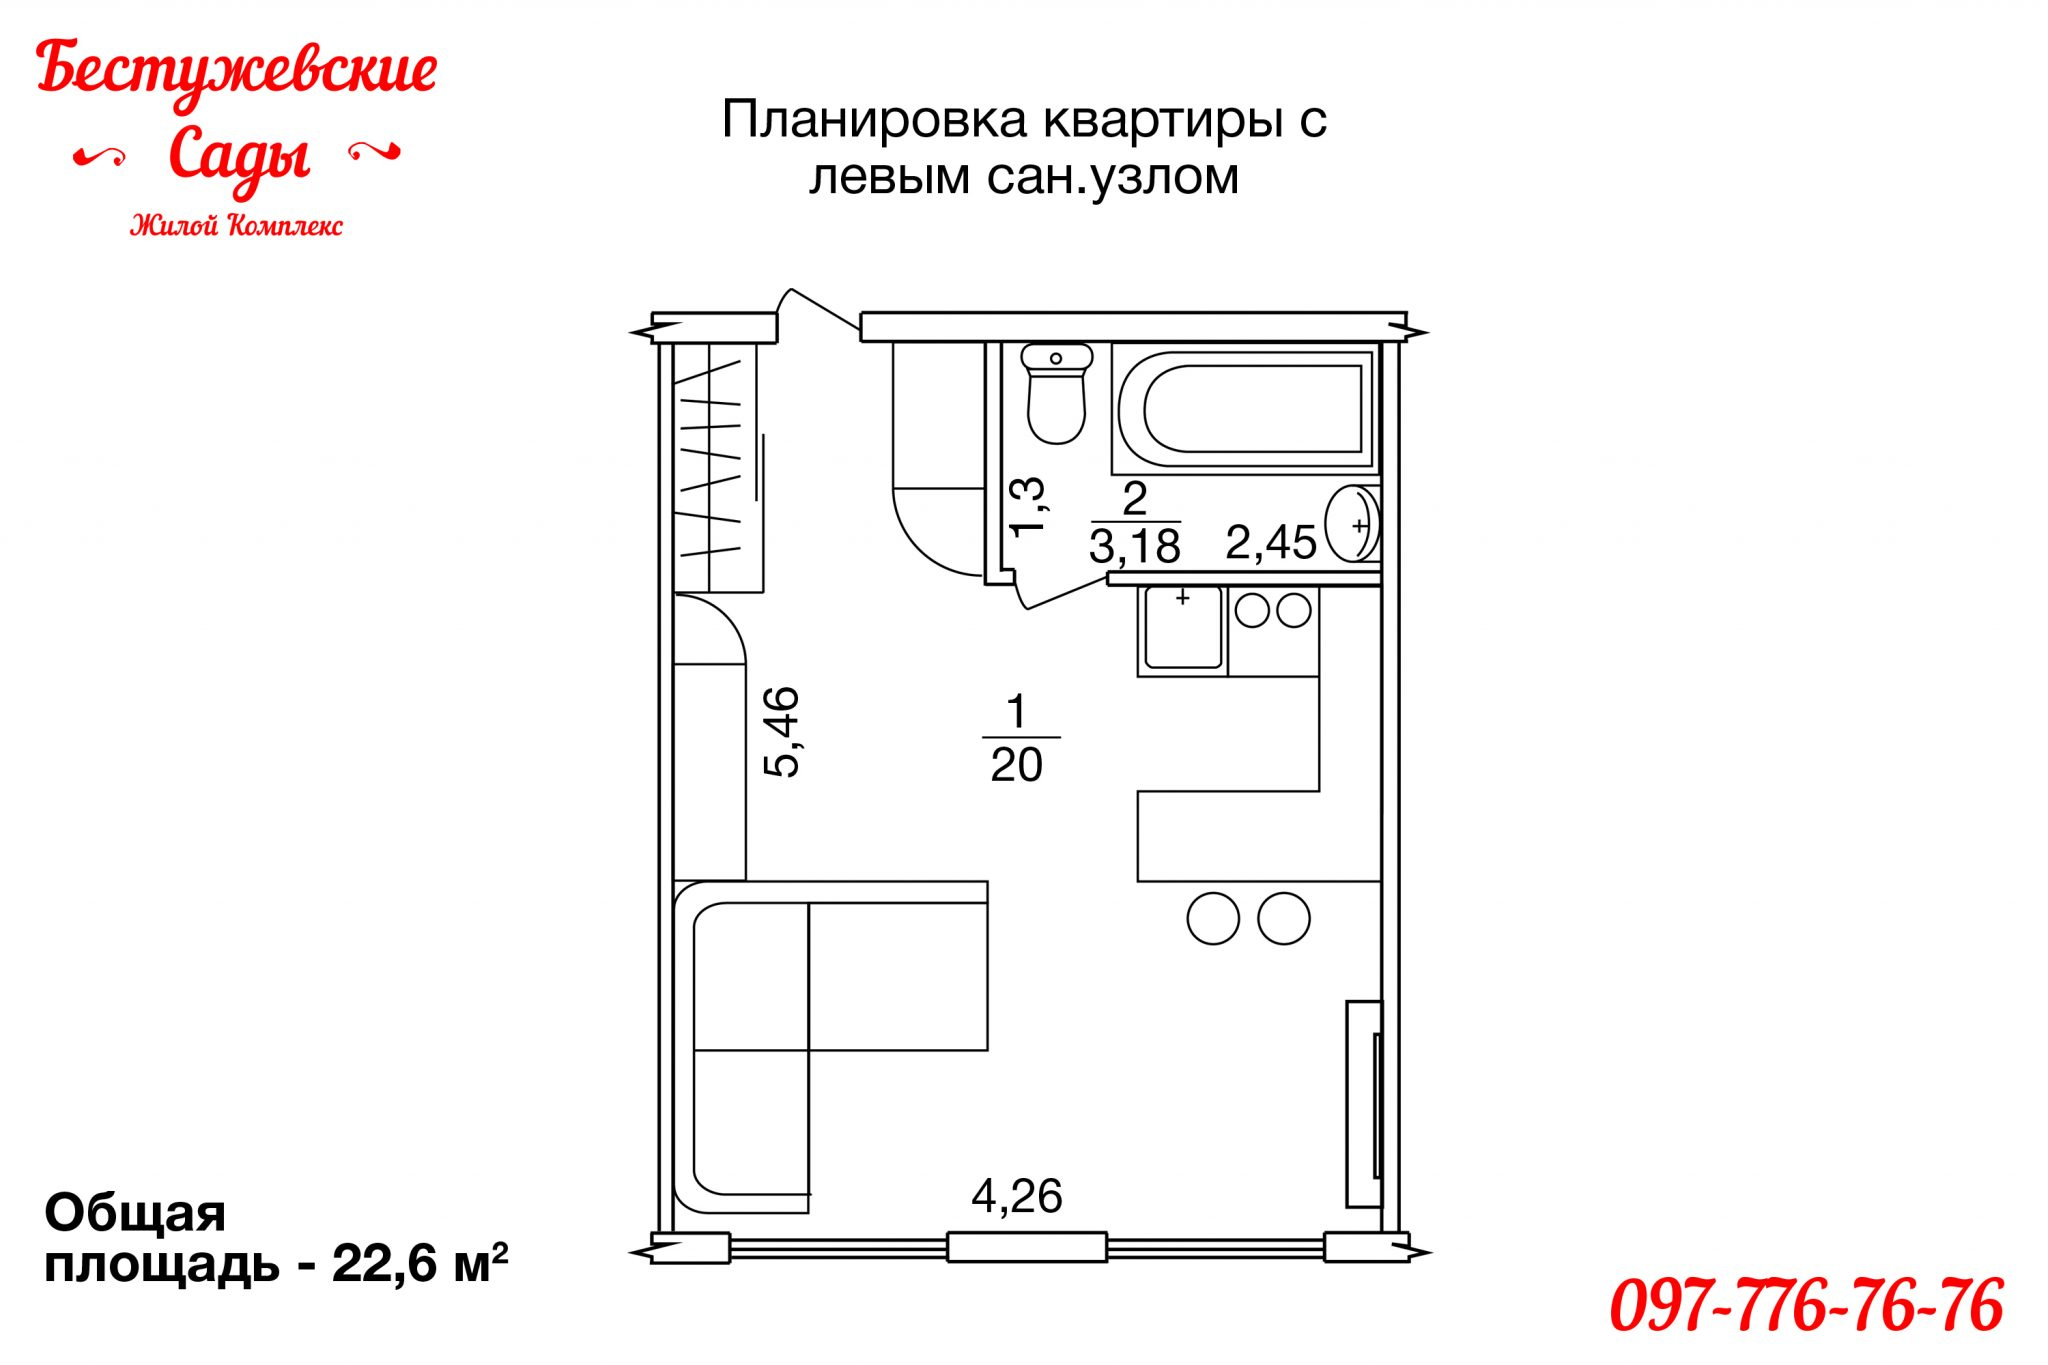 продажа малогабаритных квартир